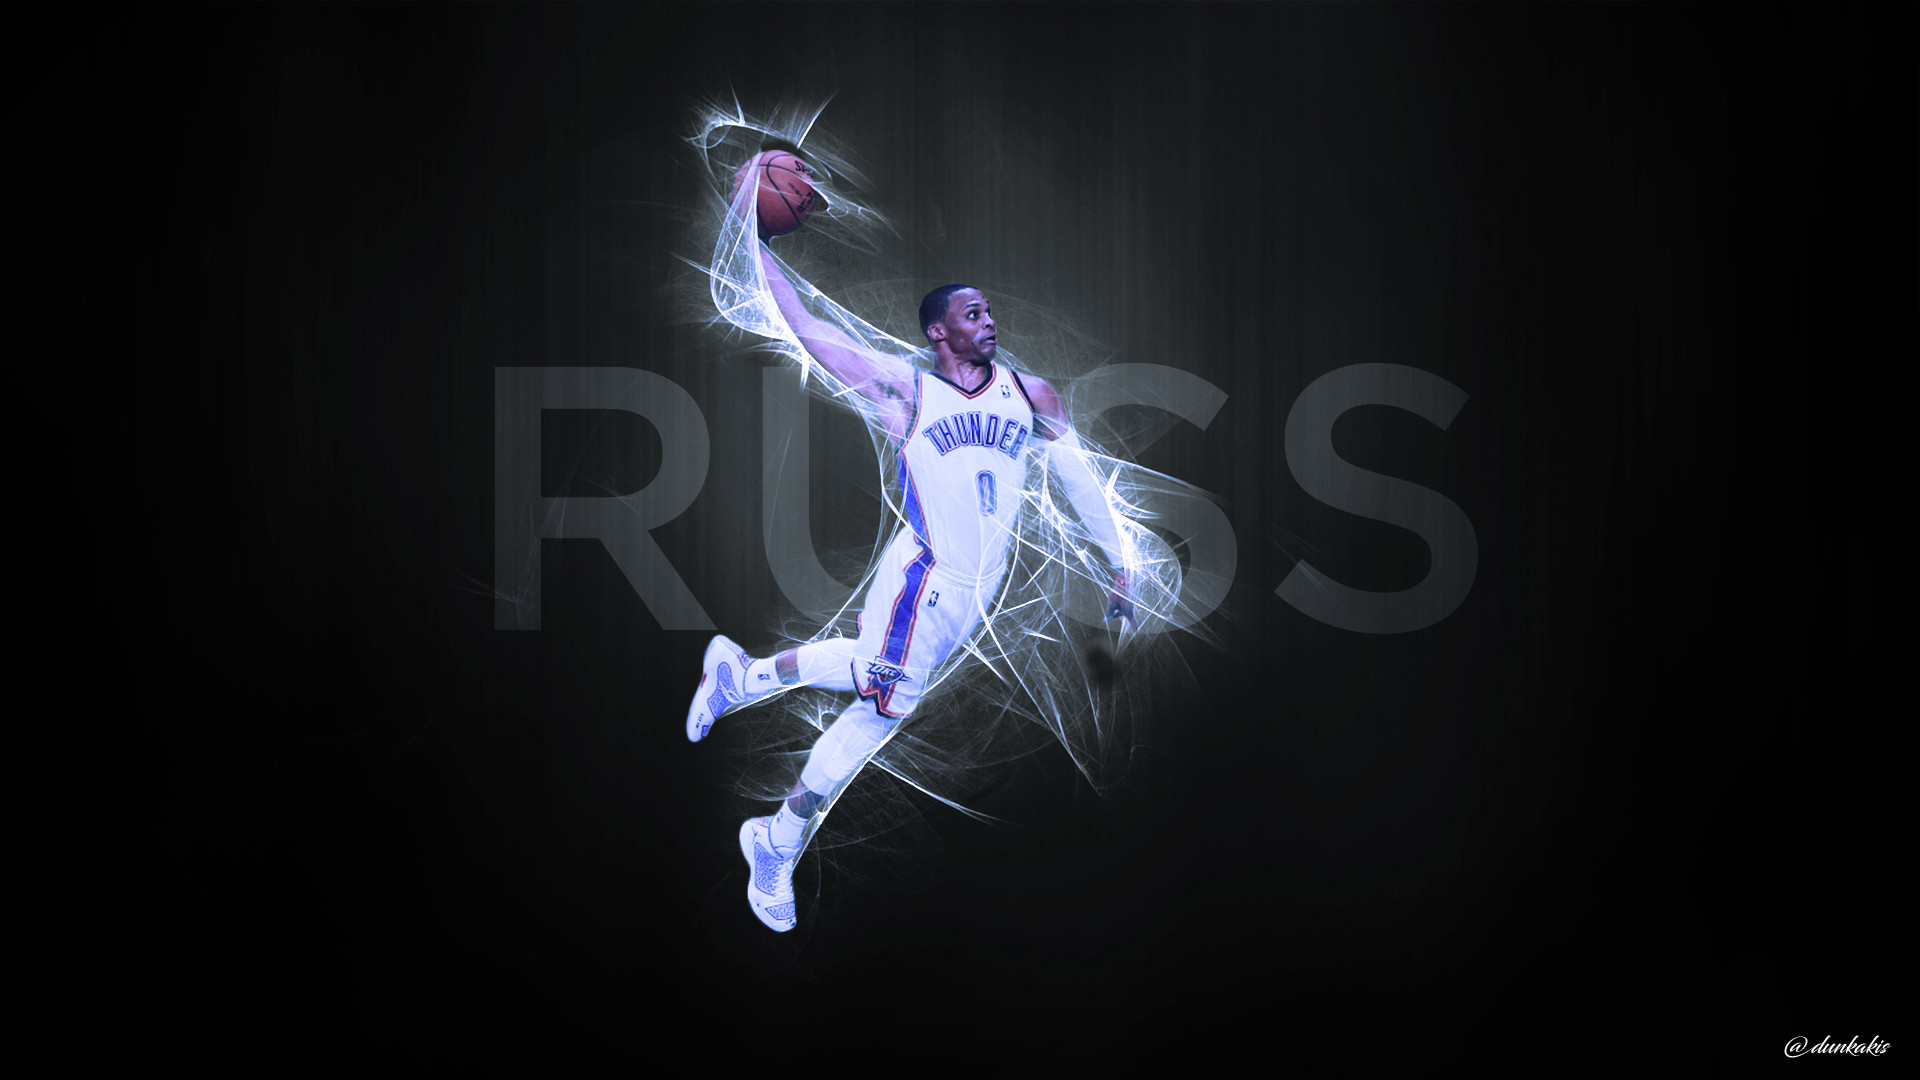 … NBA – Russell Westbrook – Wallpaper by dunkakis